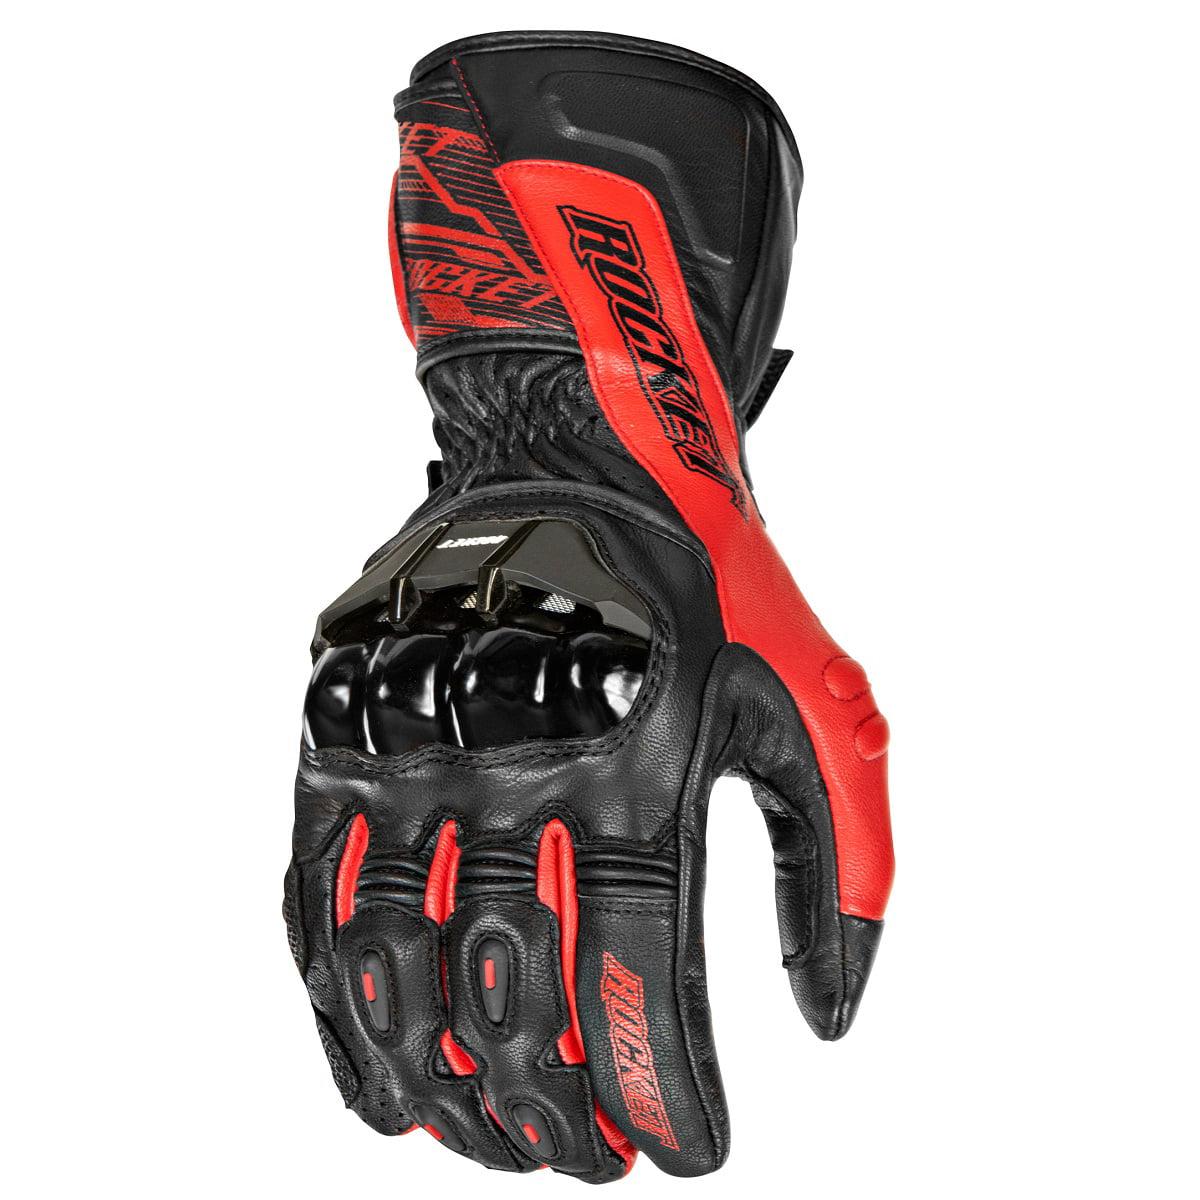 Joe Rocket Flexium TX Mens Red/Black Leather Motorcycle Gloves